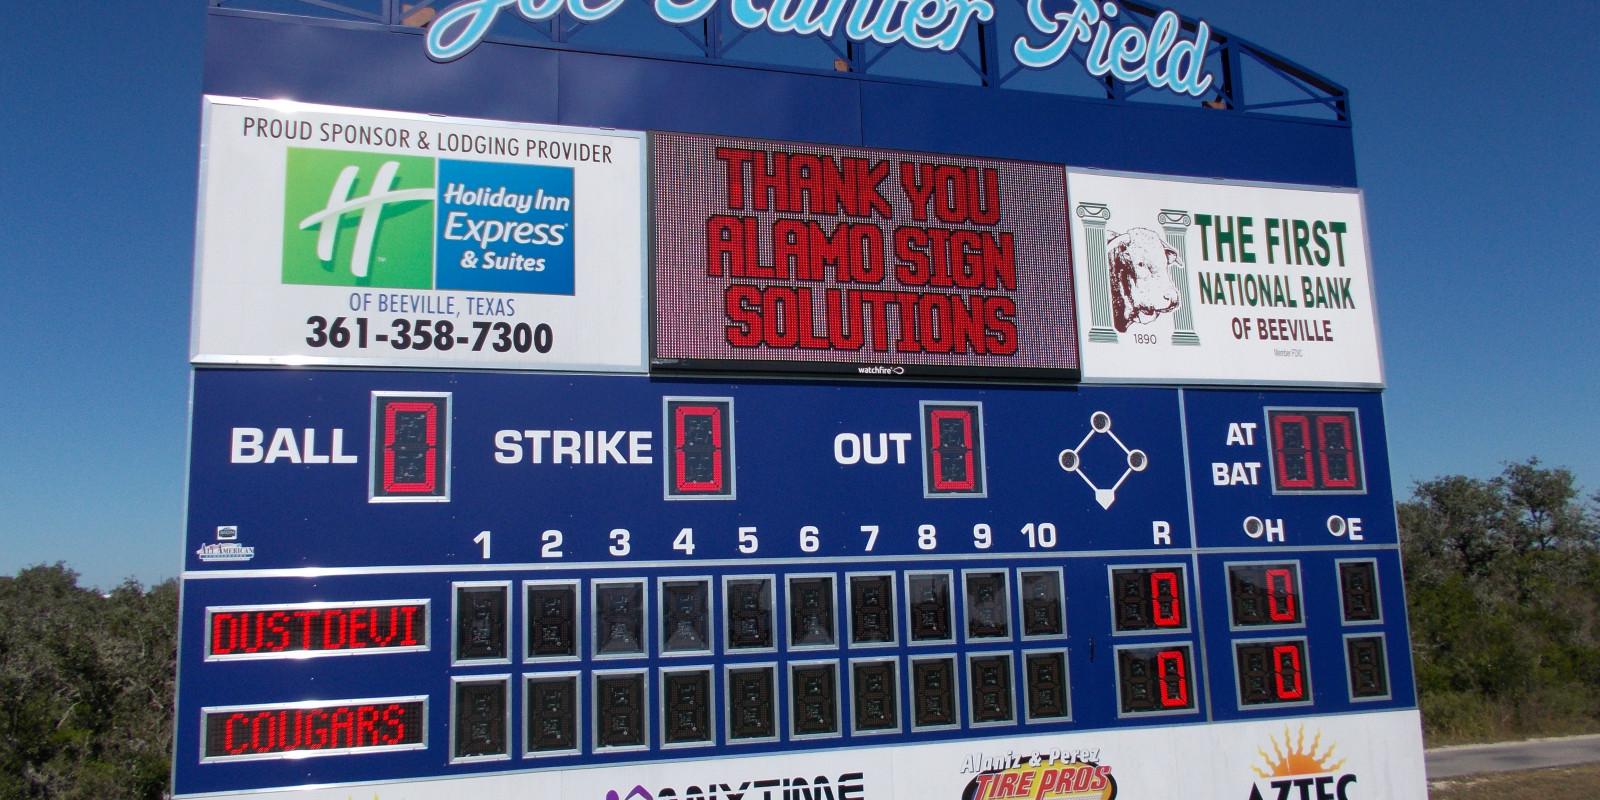 Coastal Bend College Baseball Scoreboard and Watchfire Digital Sign - Live Video Playback